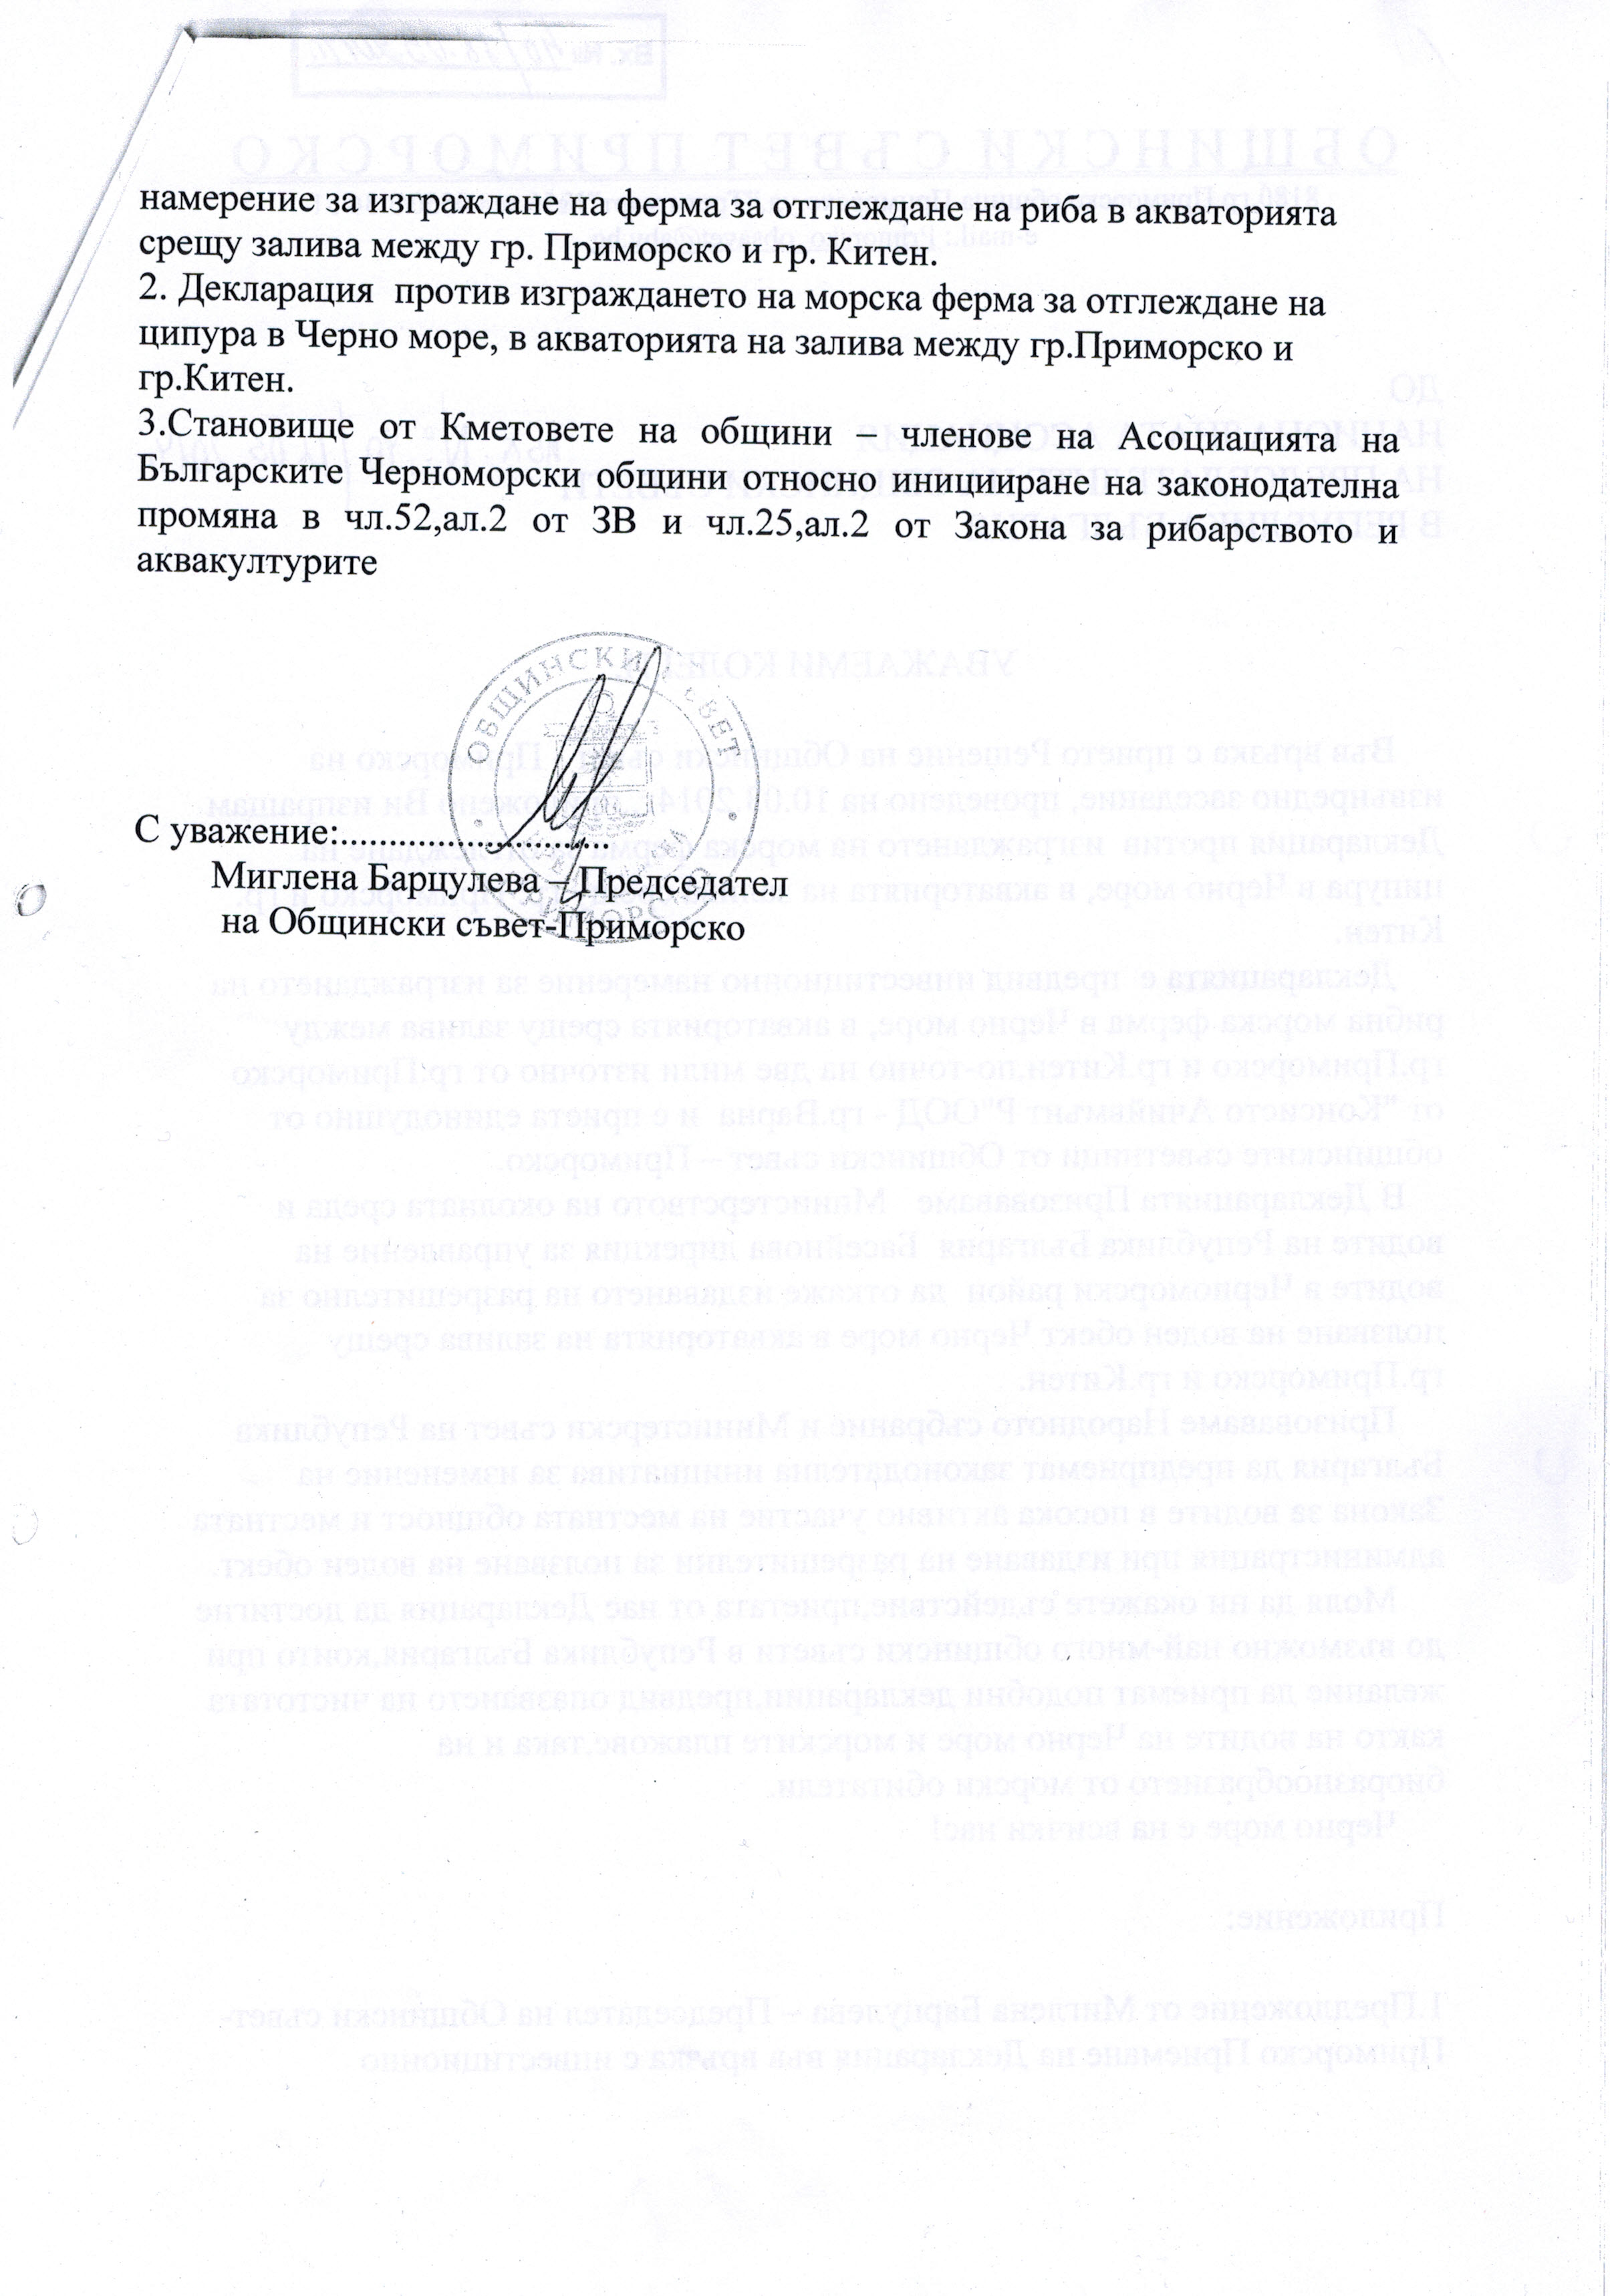 Декларация Приморско